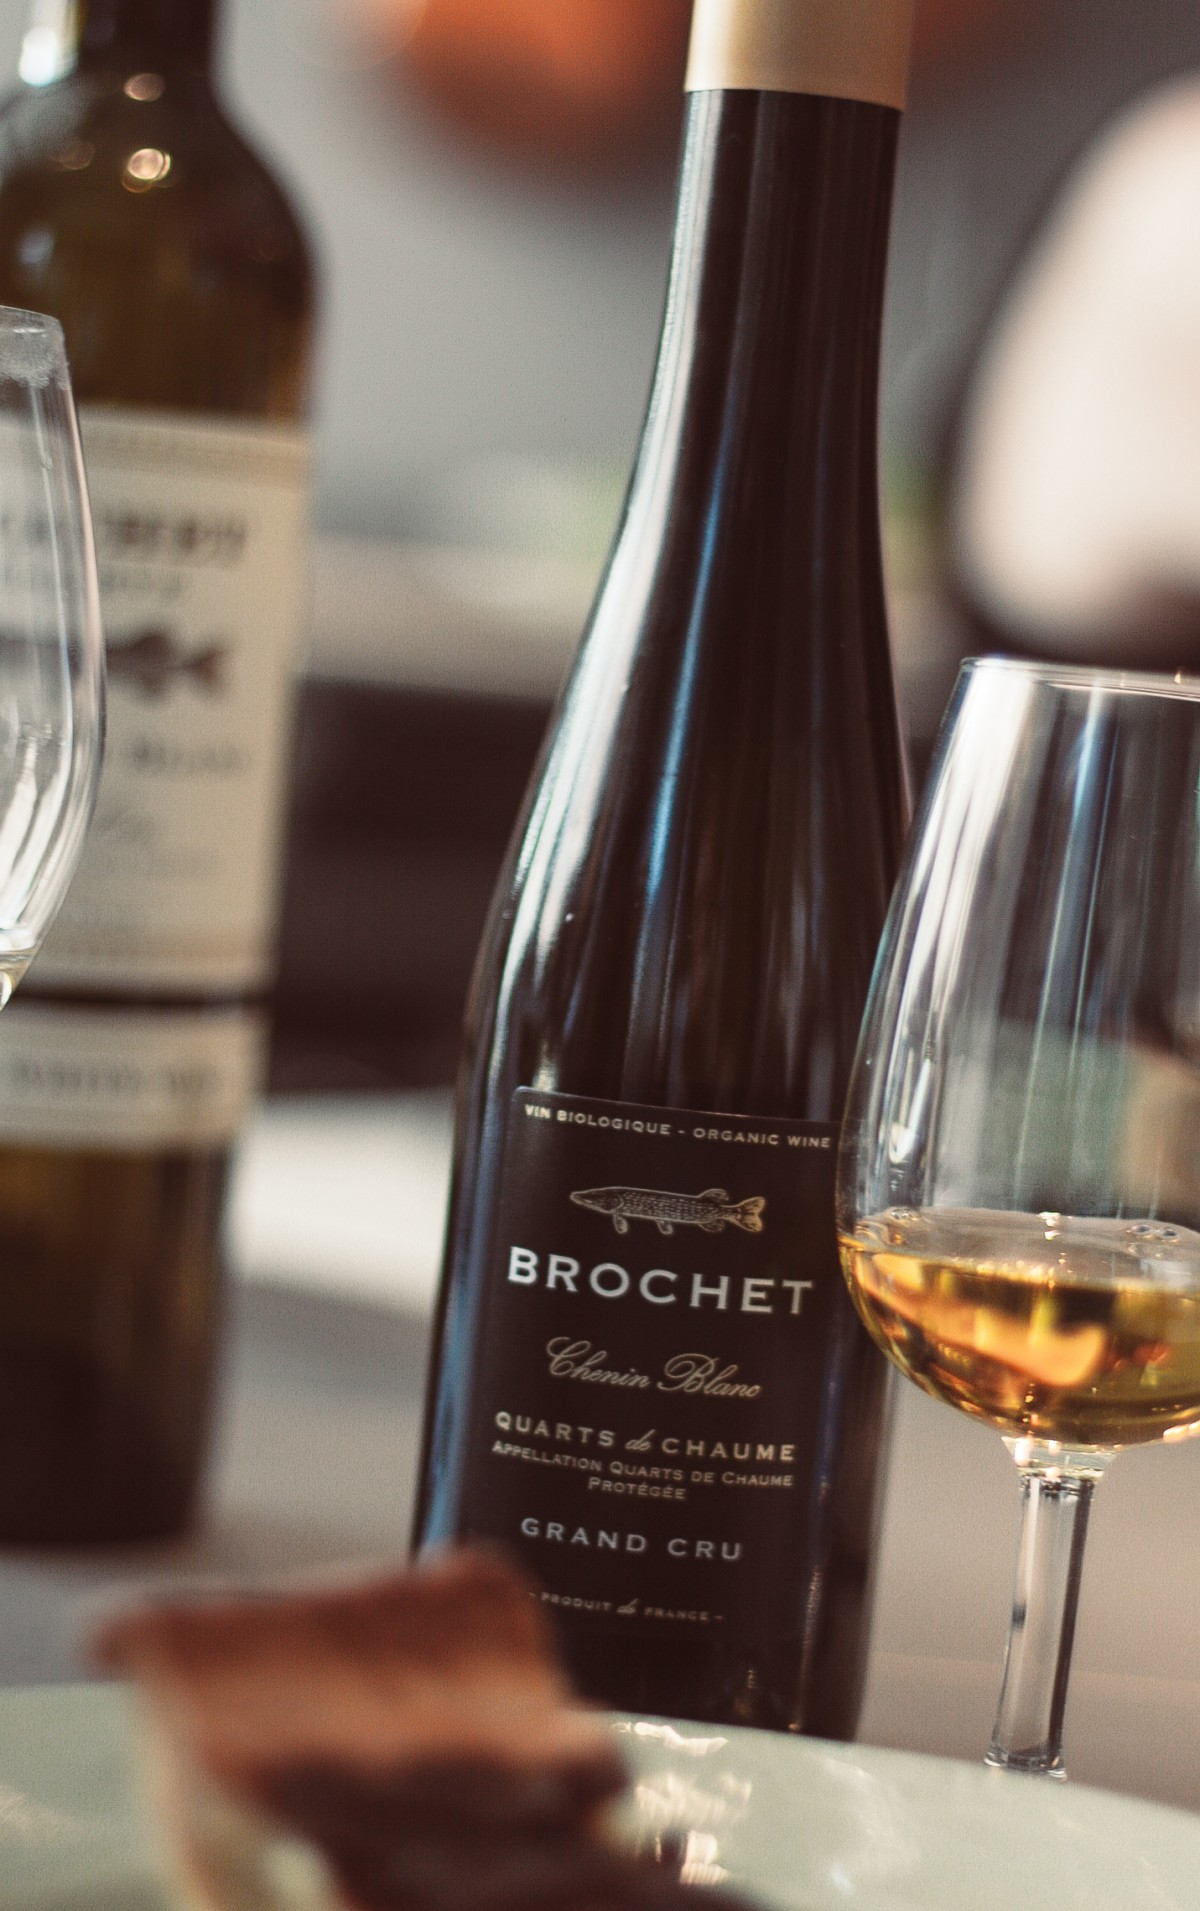 Brochet Quarts de Chaume Grand Cru 2015